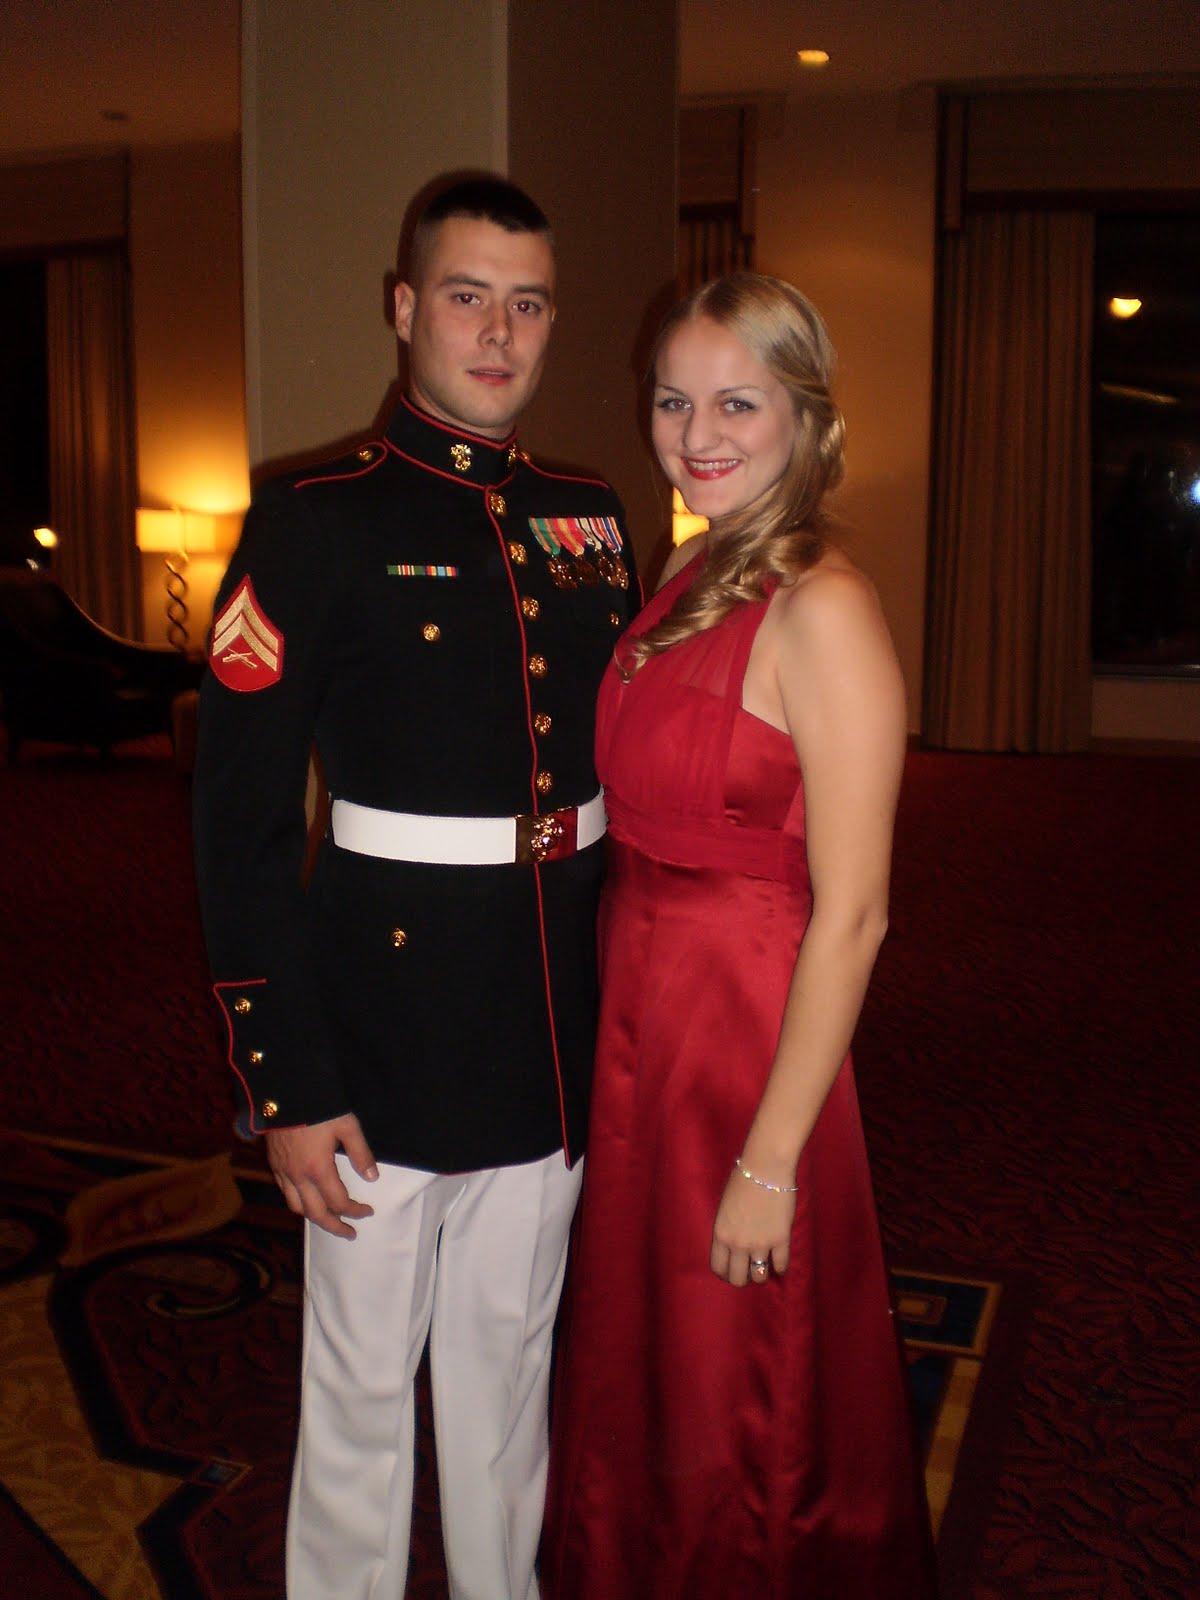 My Marine And Me Usmc Birthday Ball Dos And Don Ts